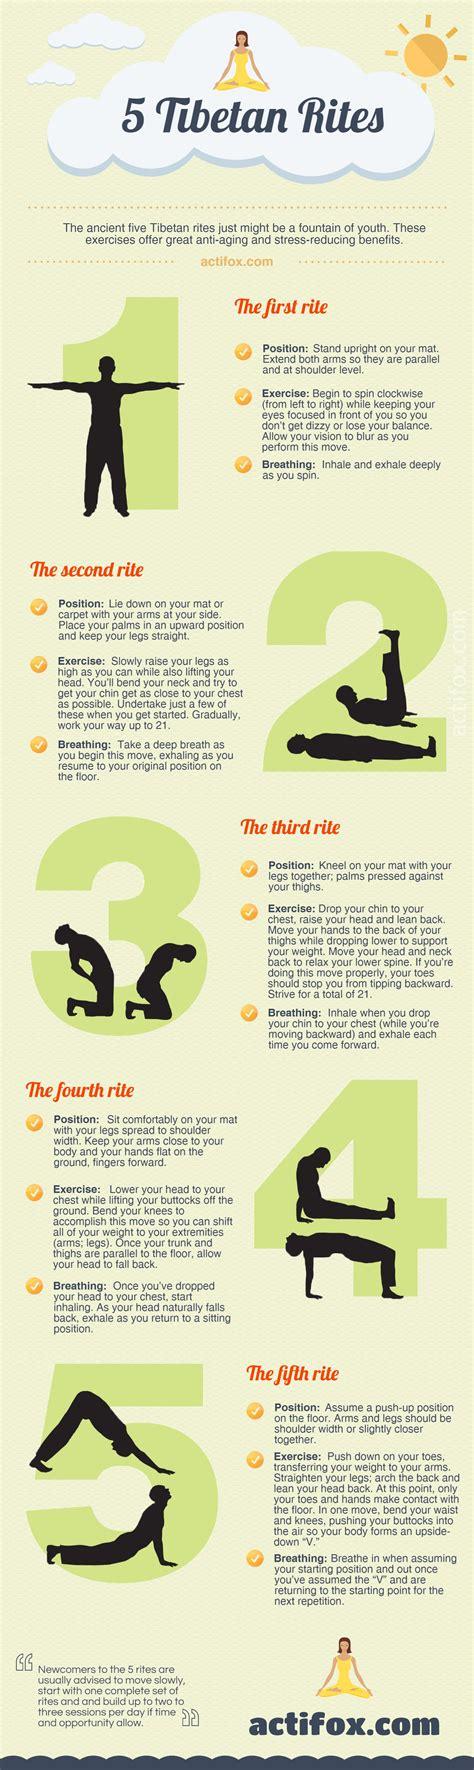 5 Tibetan Rites Detox Symptoms by Five Tibetan Rites Exercises Zen